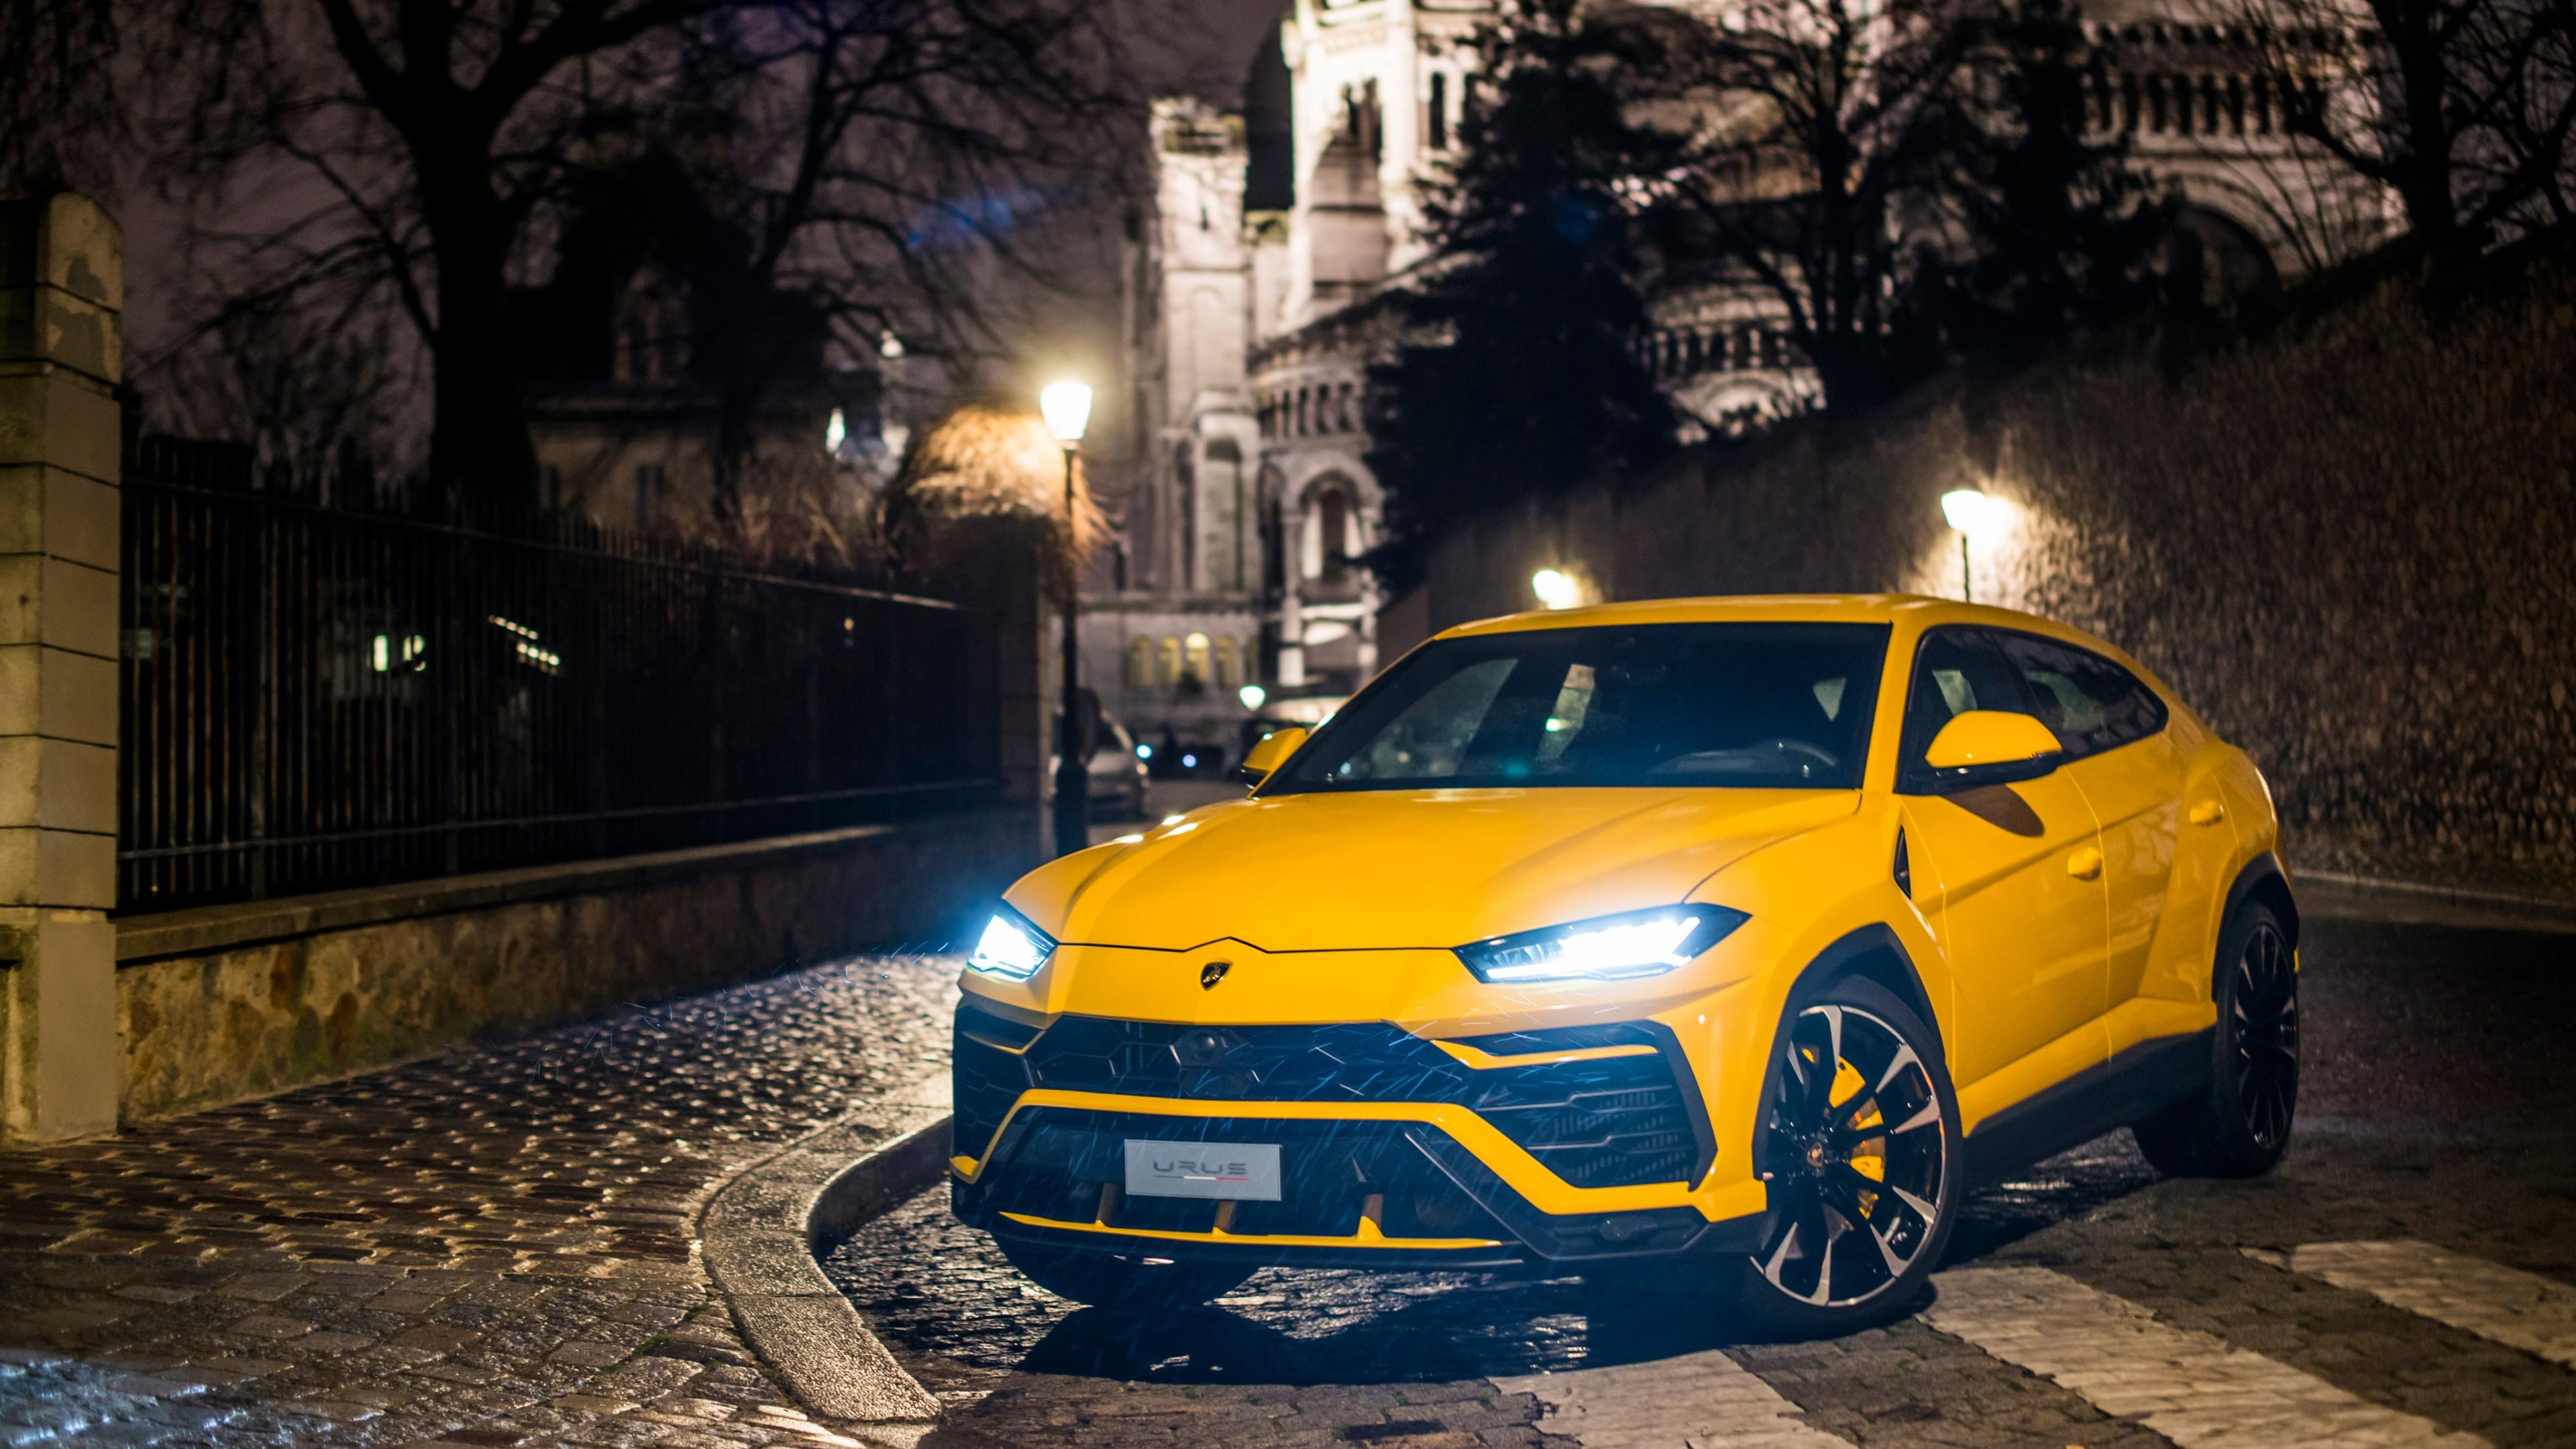 2018 Best Car Wallpapers: Lamborghini Urus 2018 4K Wallpaper